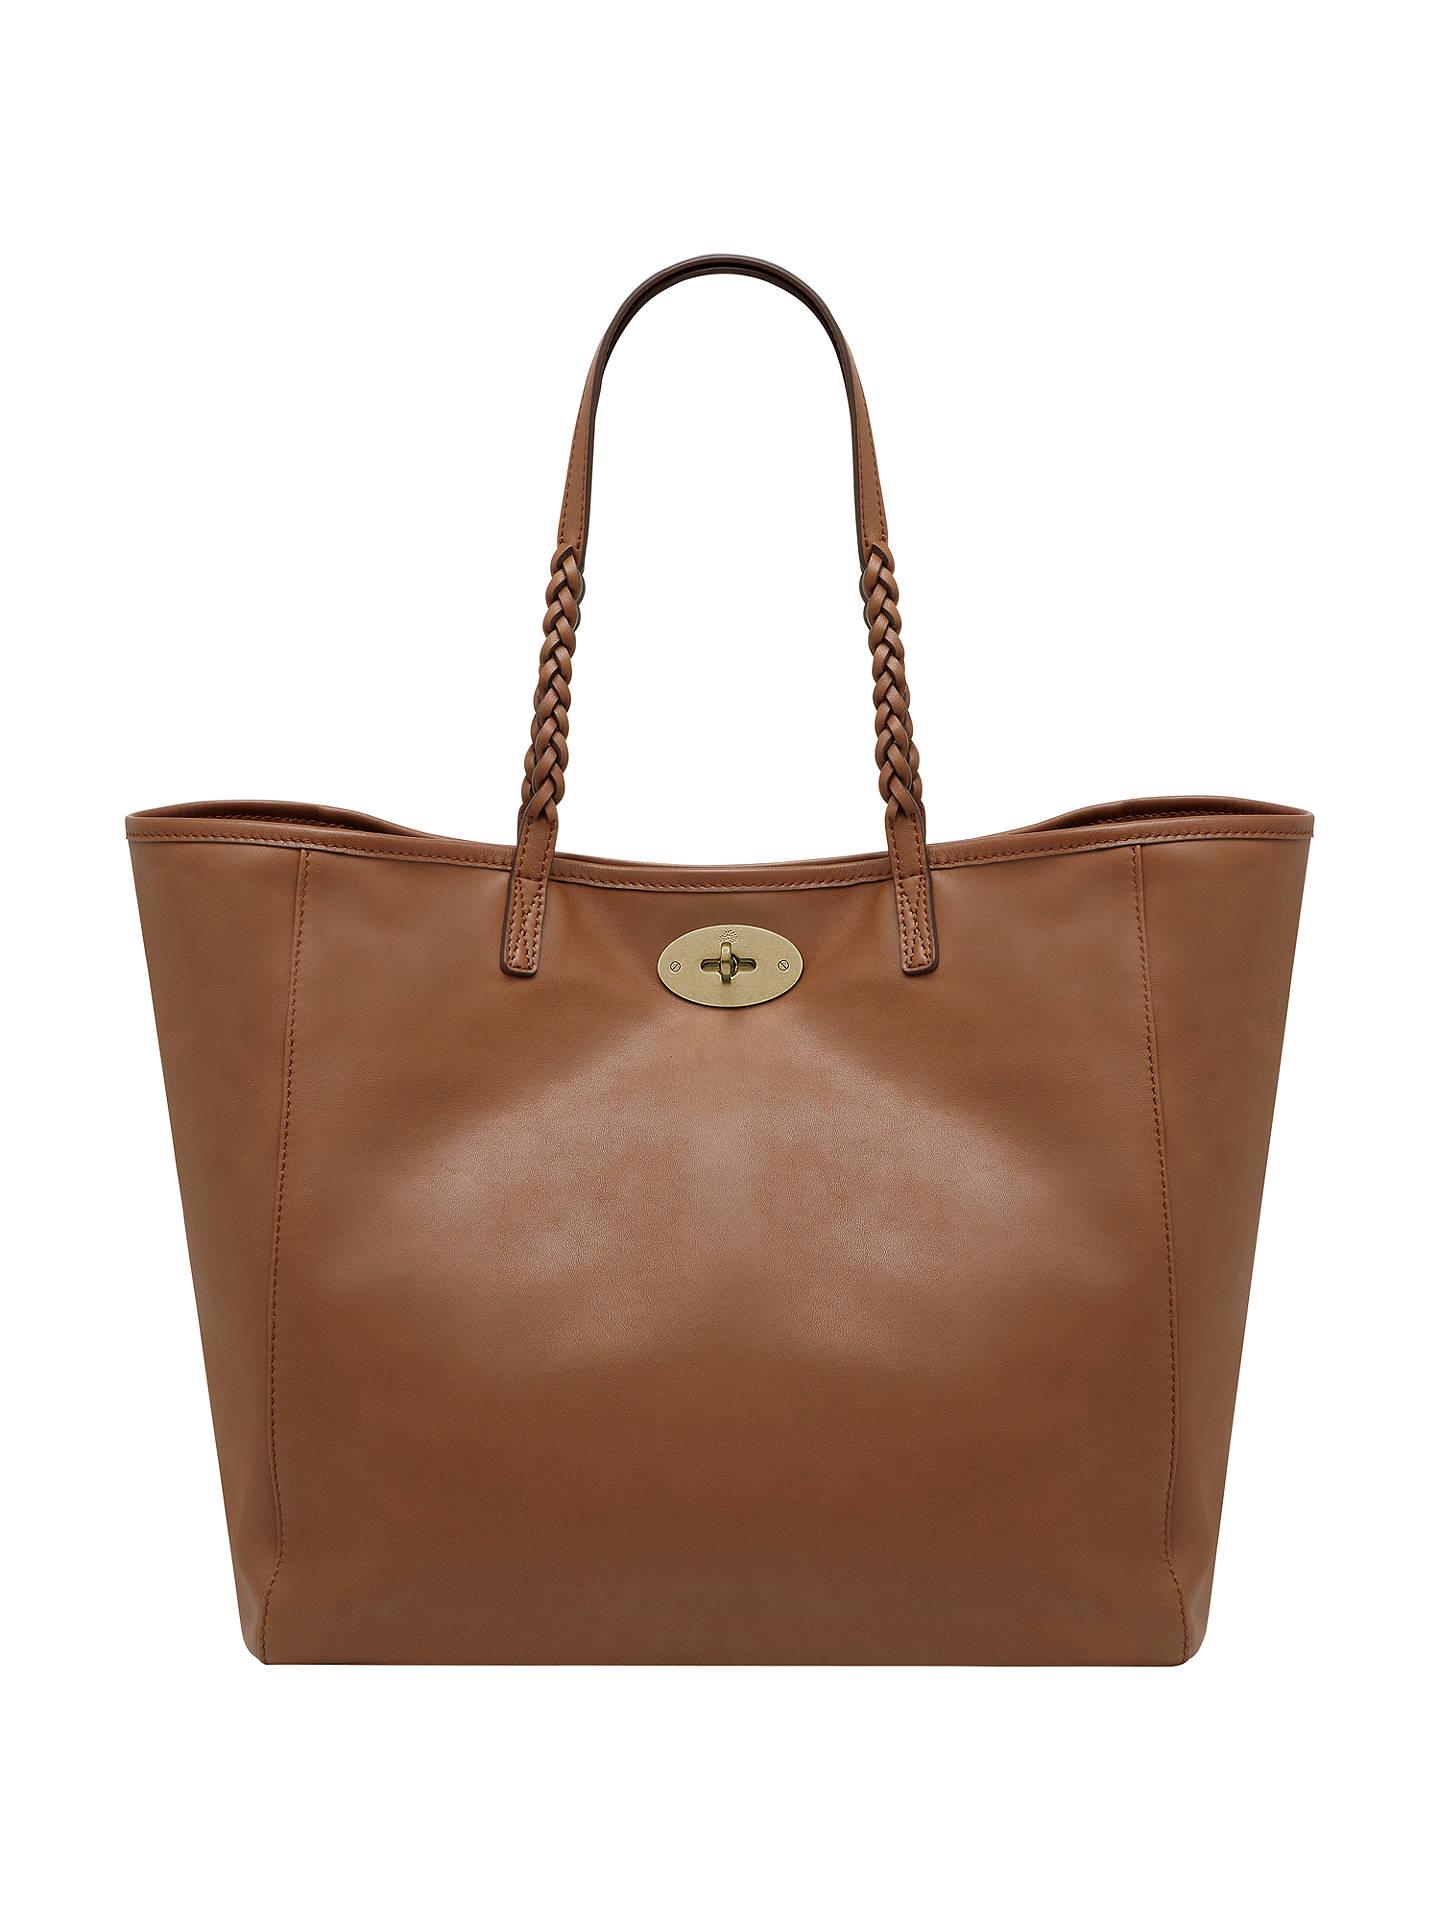 588b963025d0 Mulberry Medium Dorset Tote Handbag at John Lewis   Partners